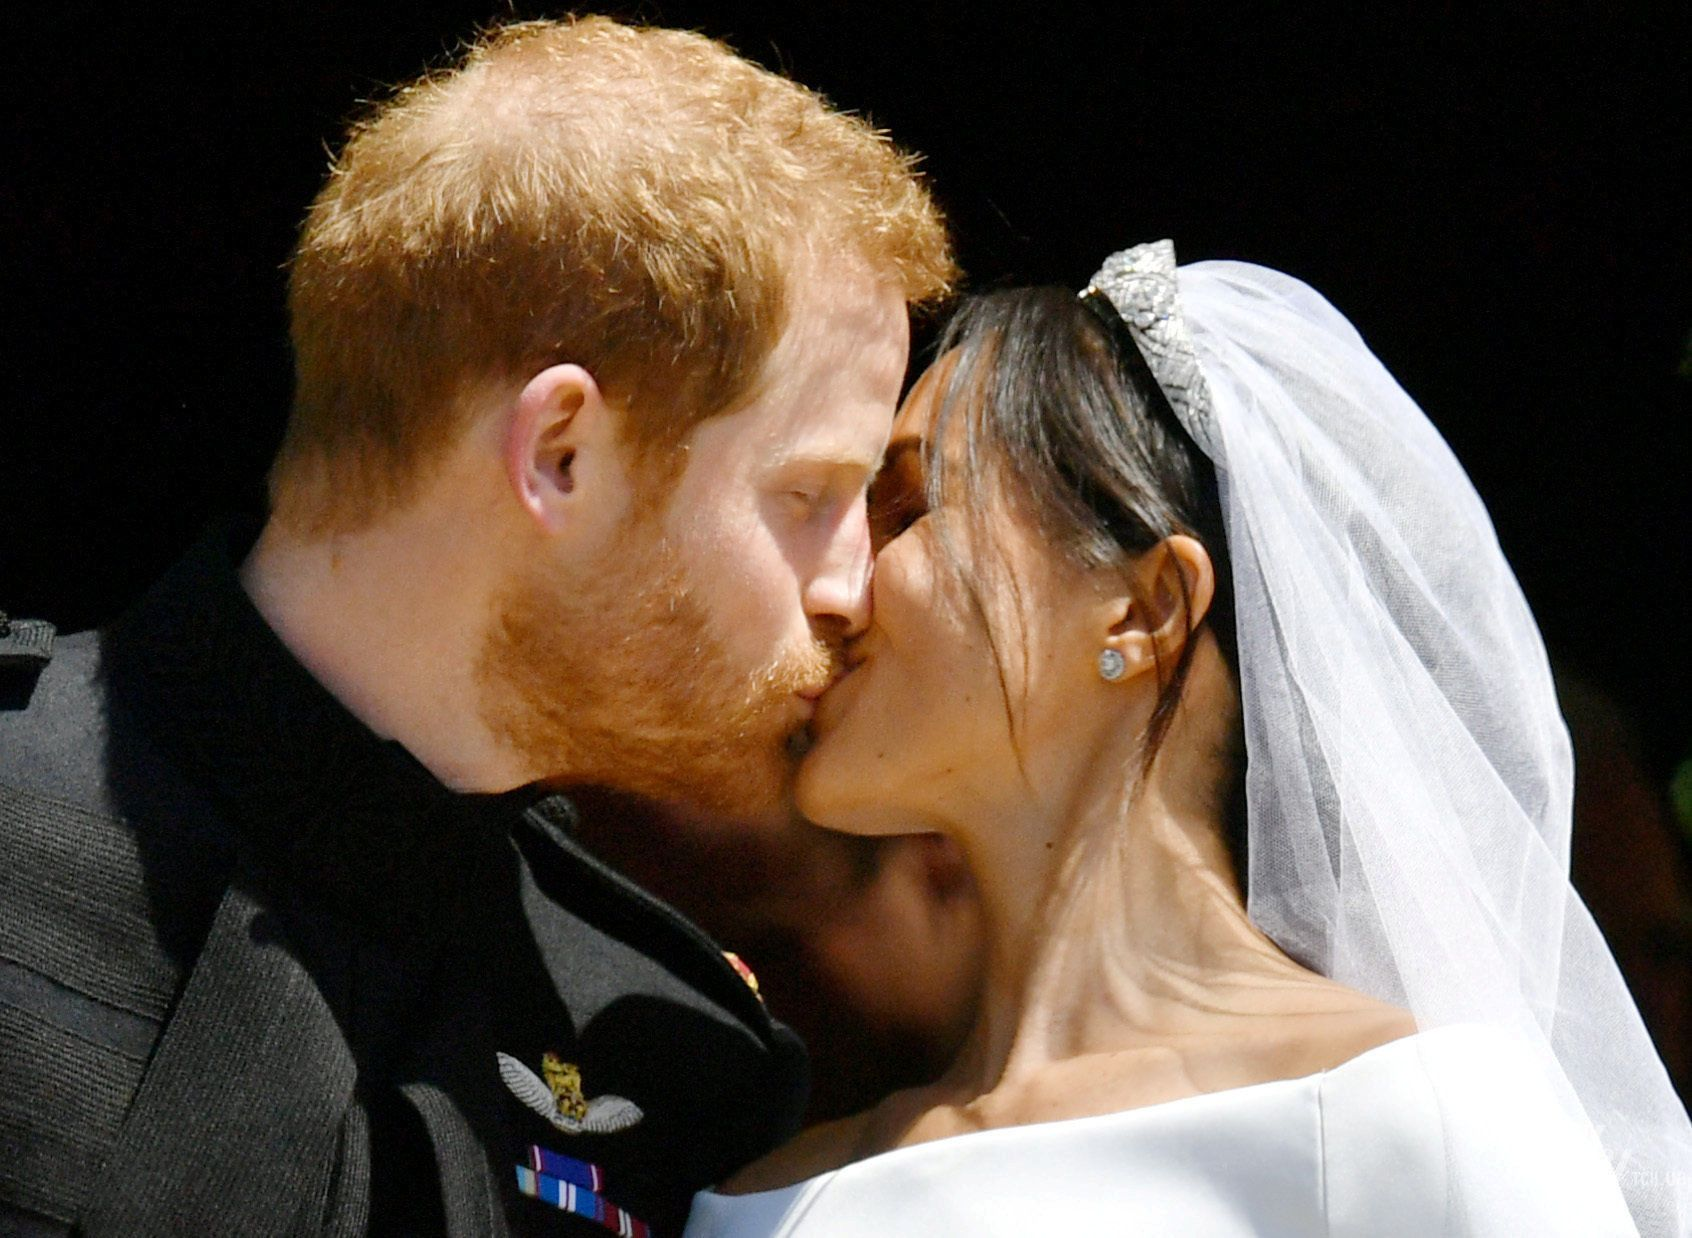 Поцелуй принца Гарри и Меган Маркл_7